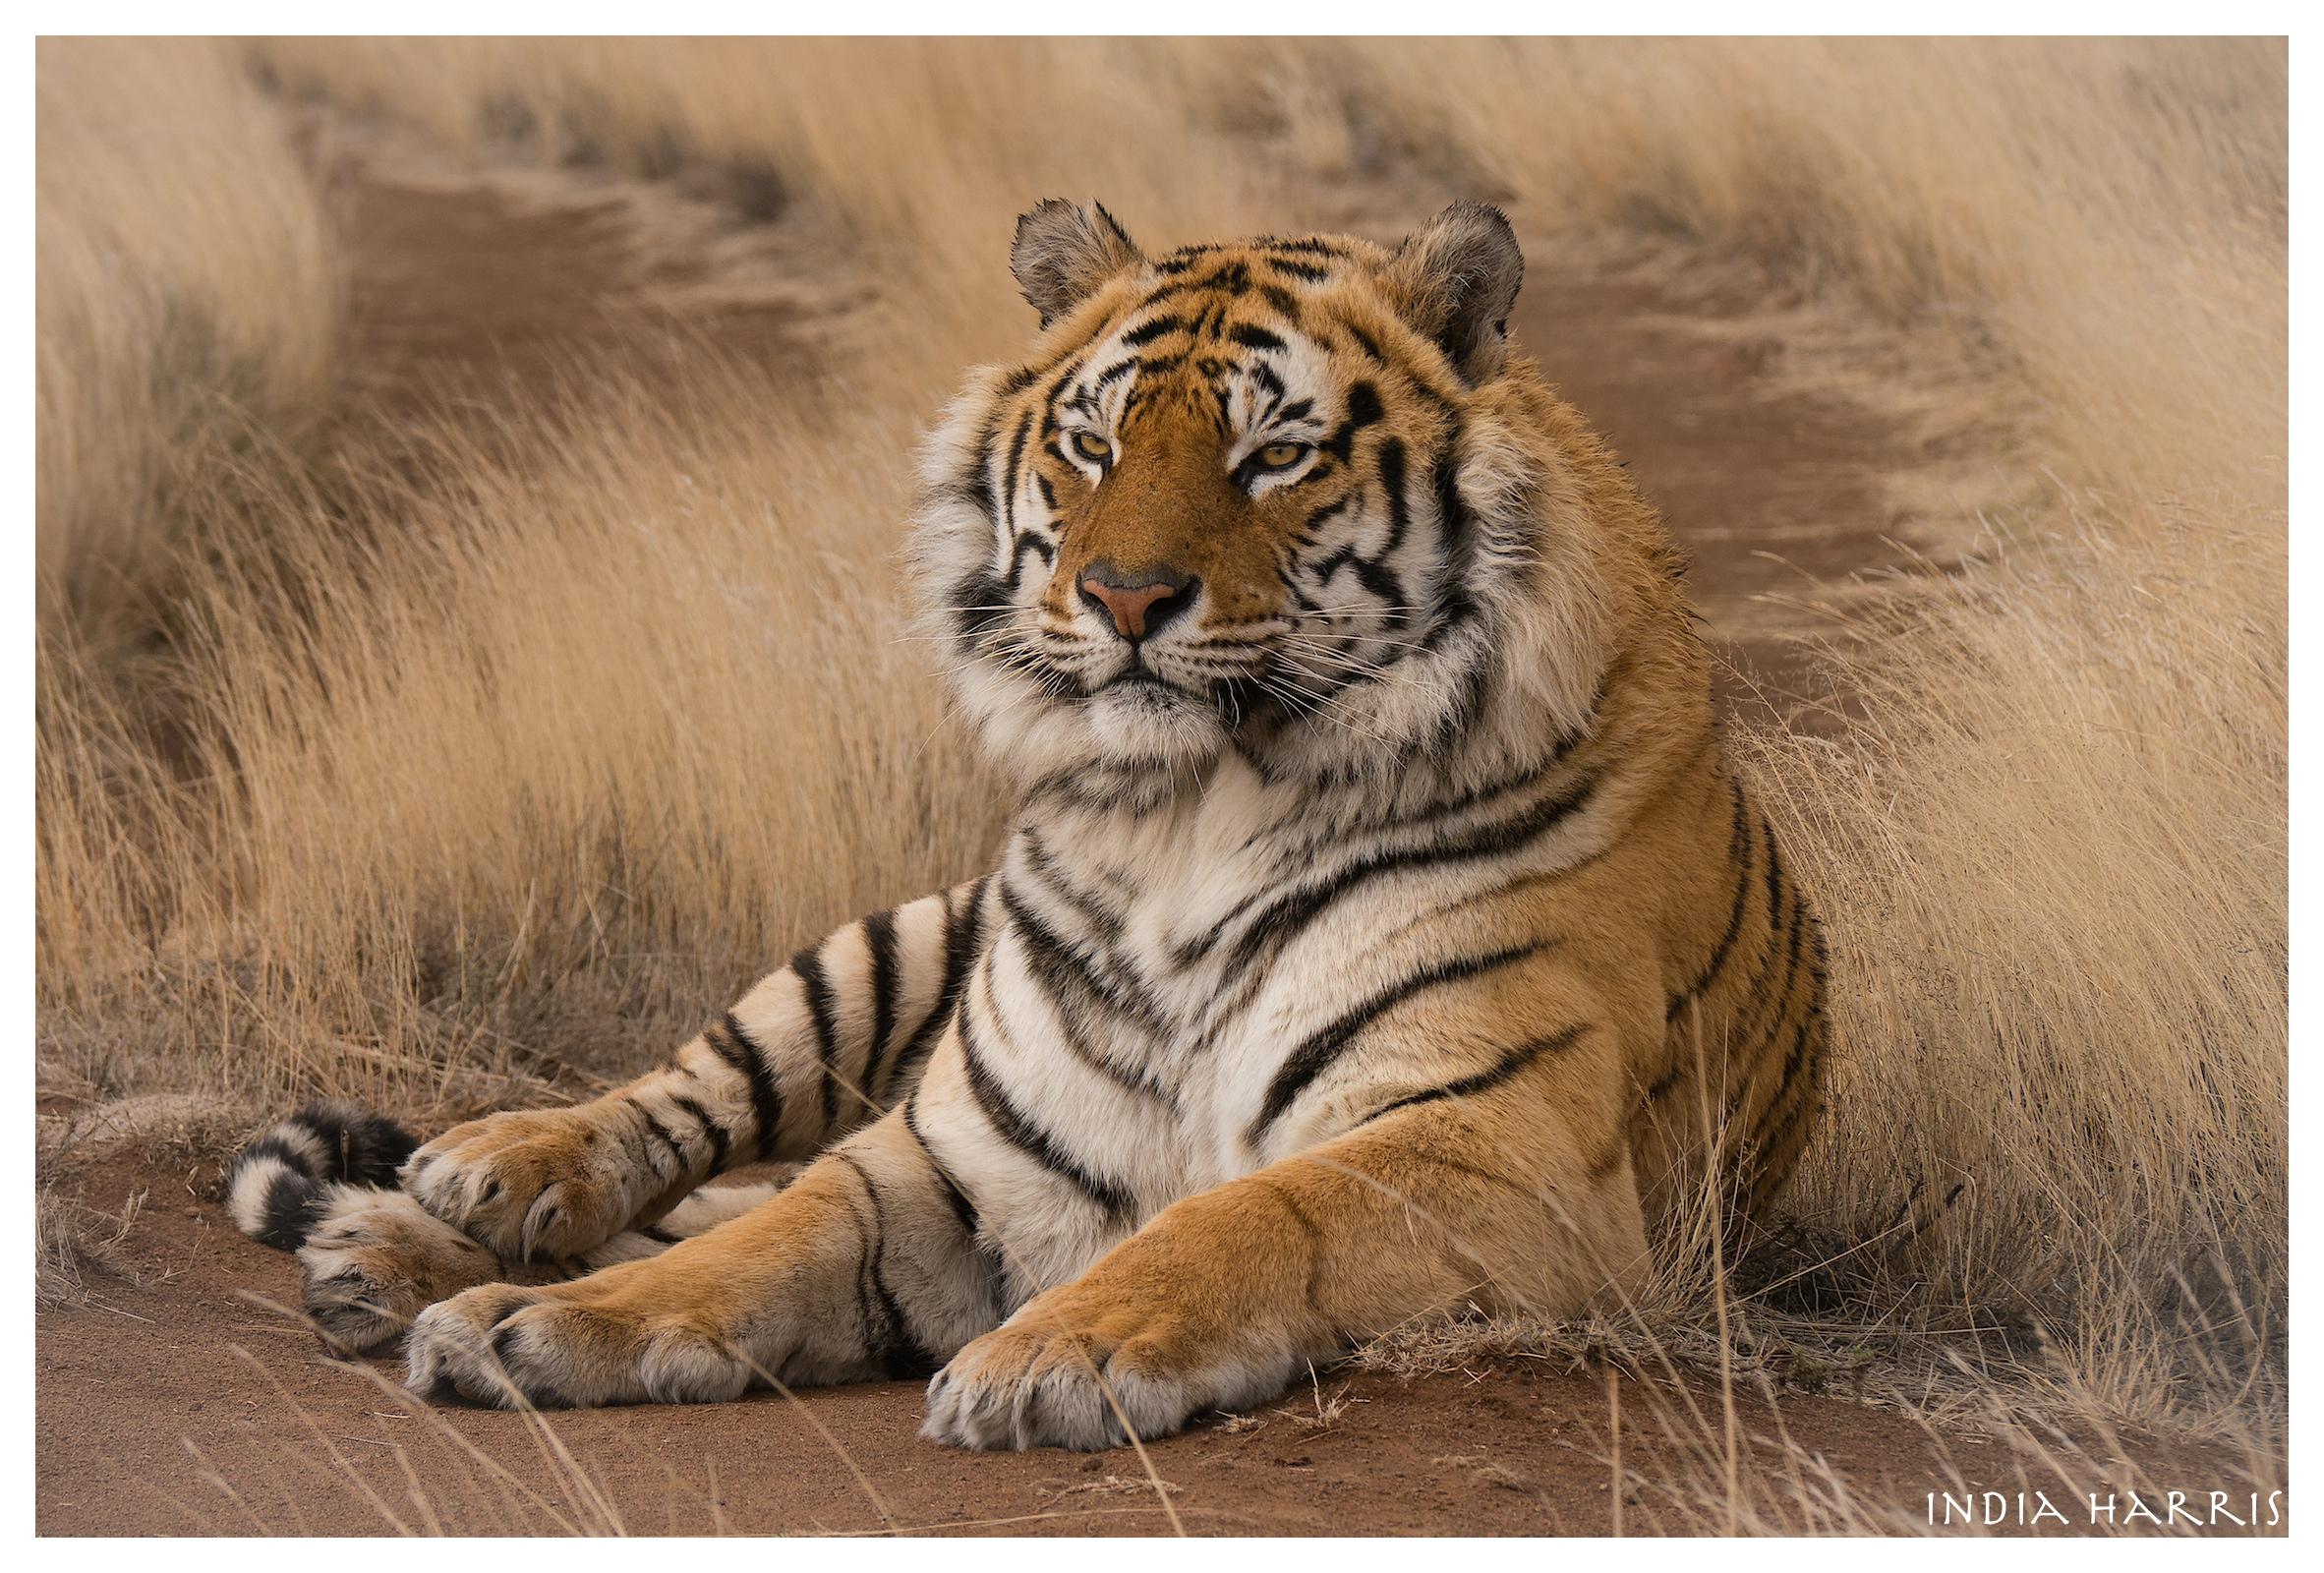 Tiger Photography | indiaharrisdotcom